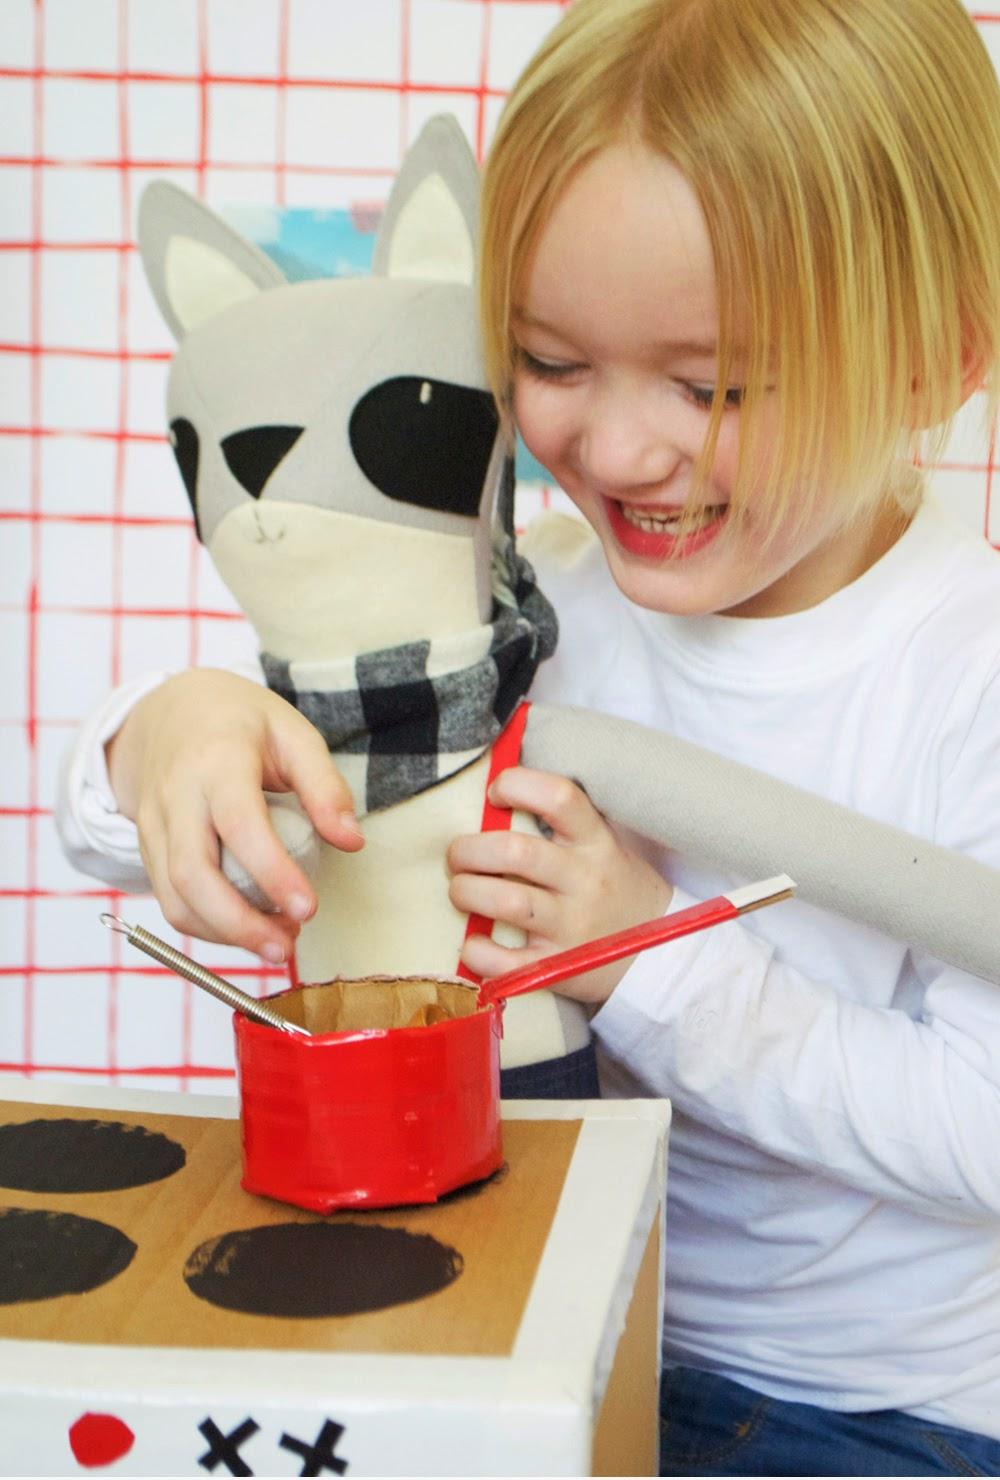 DIY jueguetes con cartón / cardboard toys